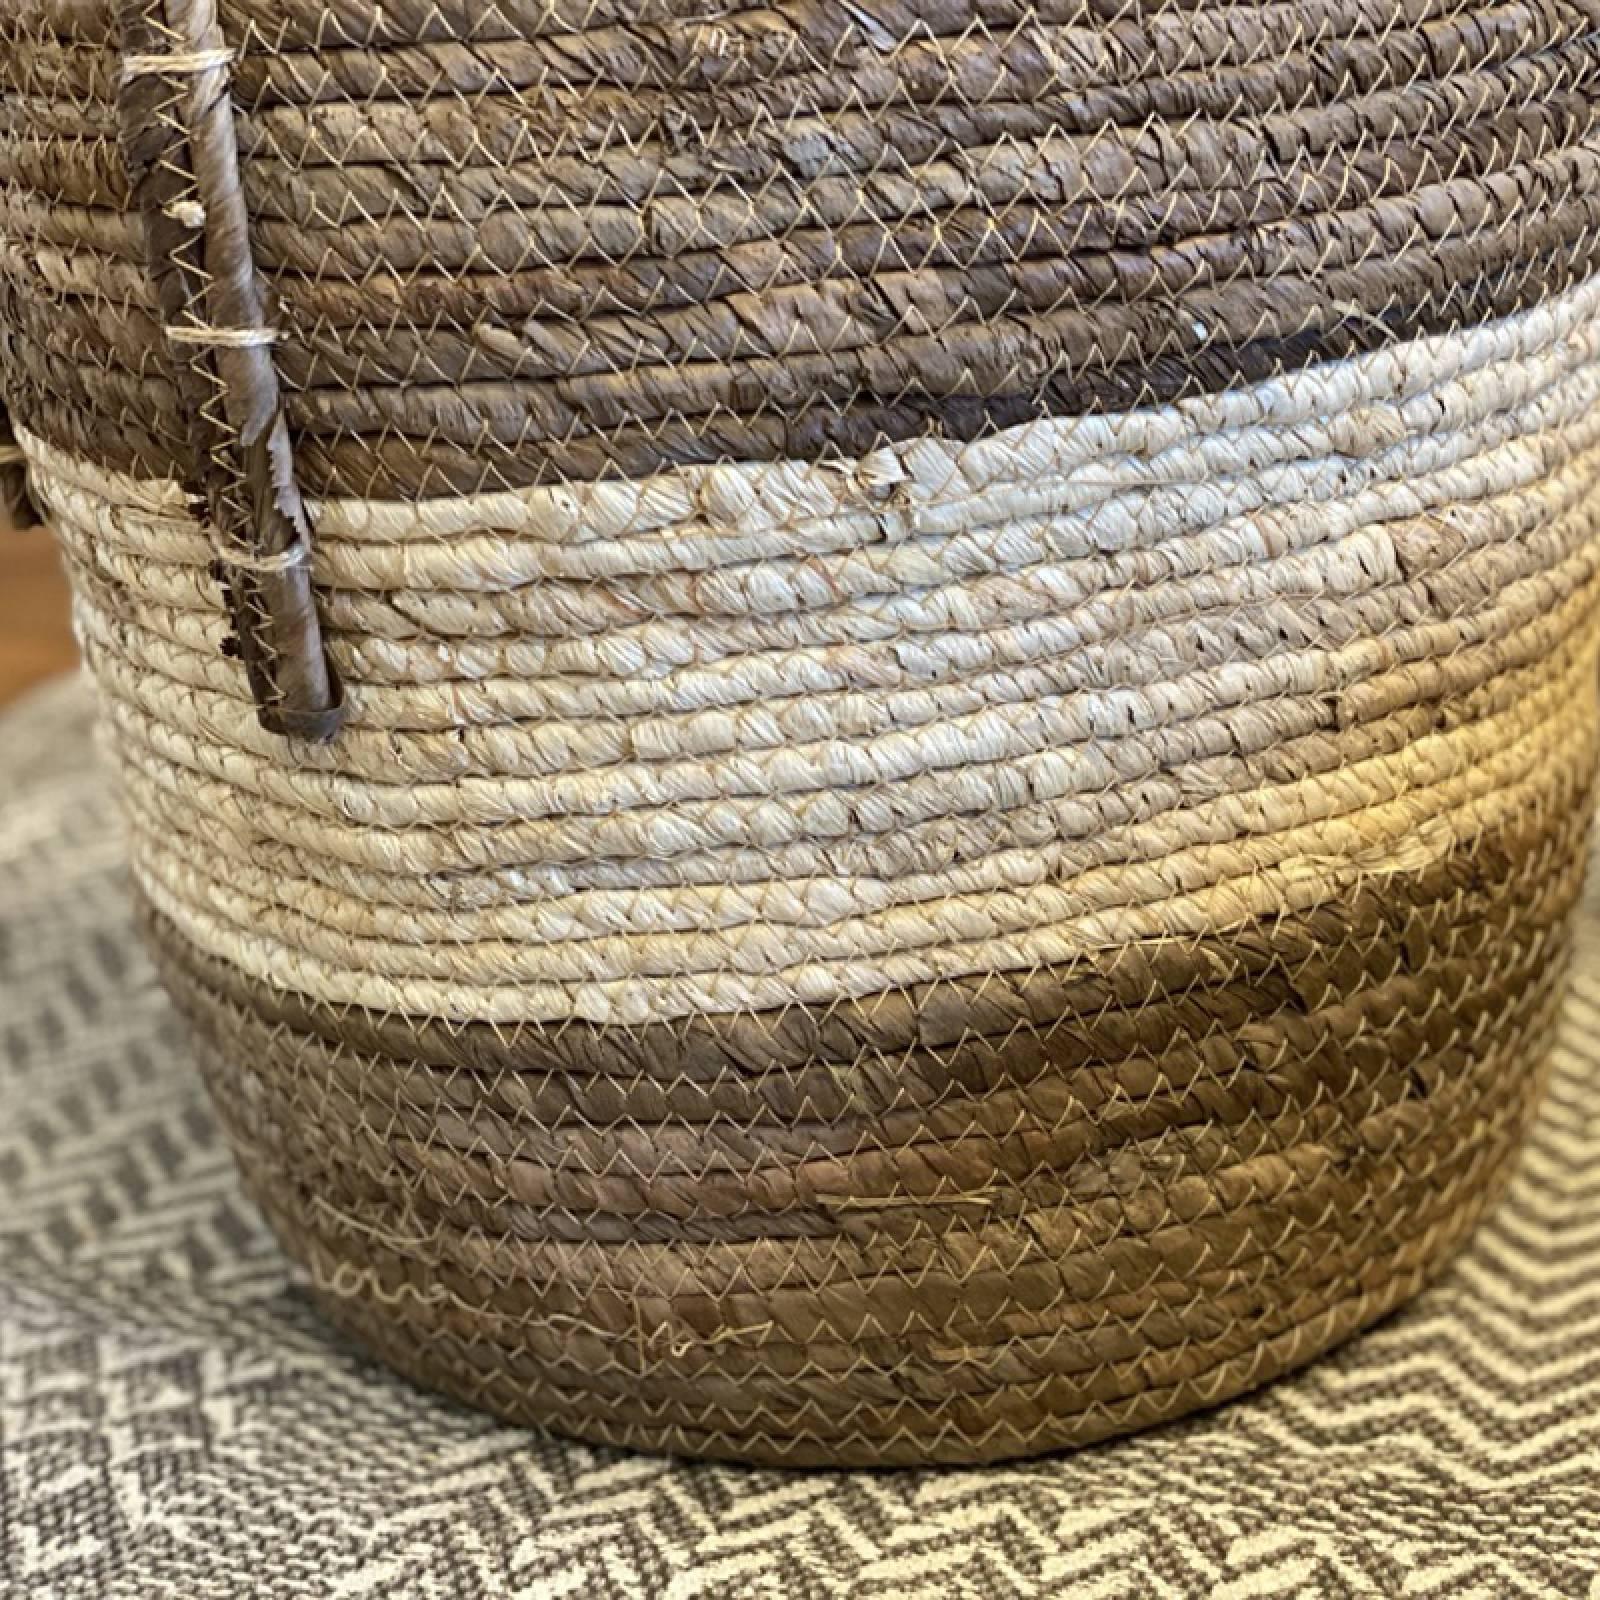 Large Striped Banana Leaf Basket With Handles H:30x36 thumbnails